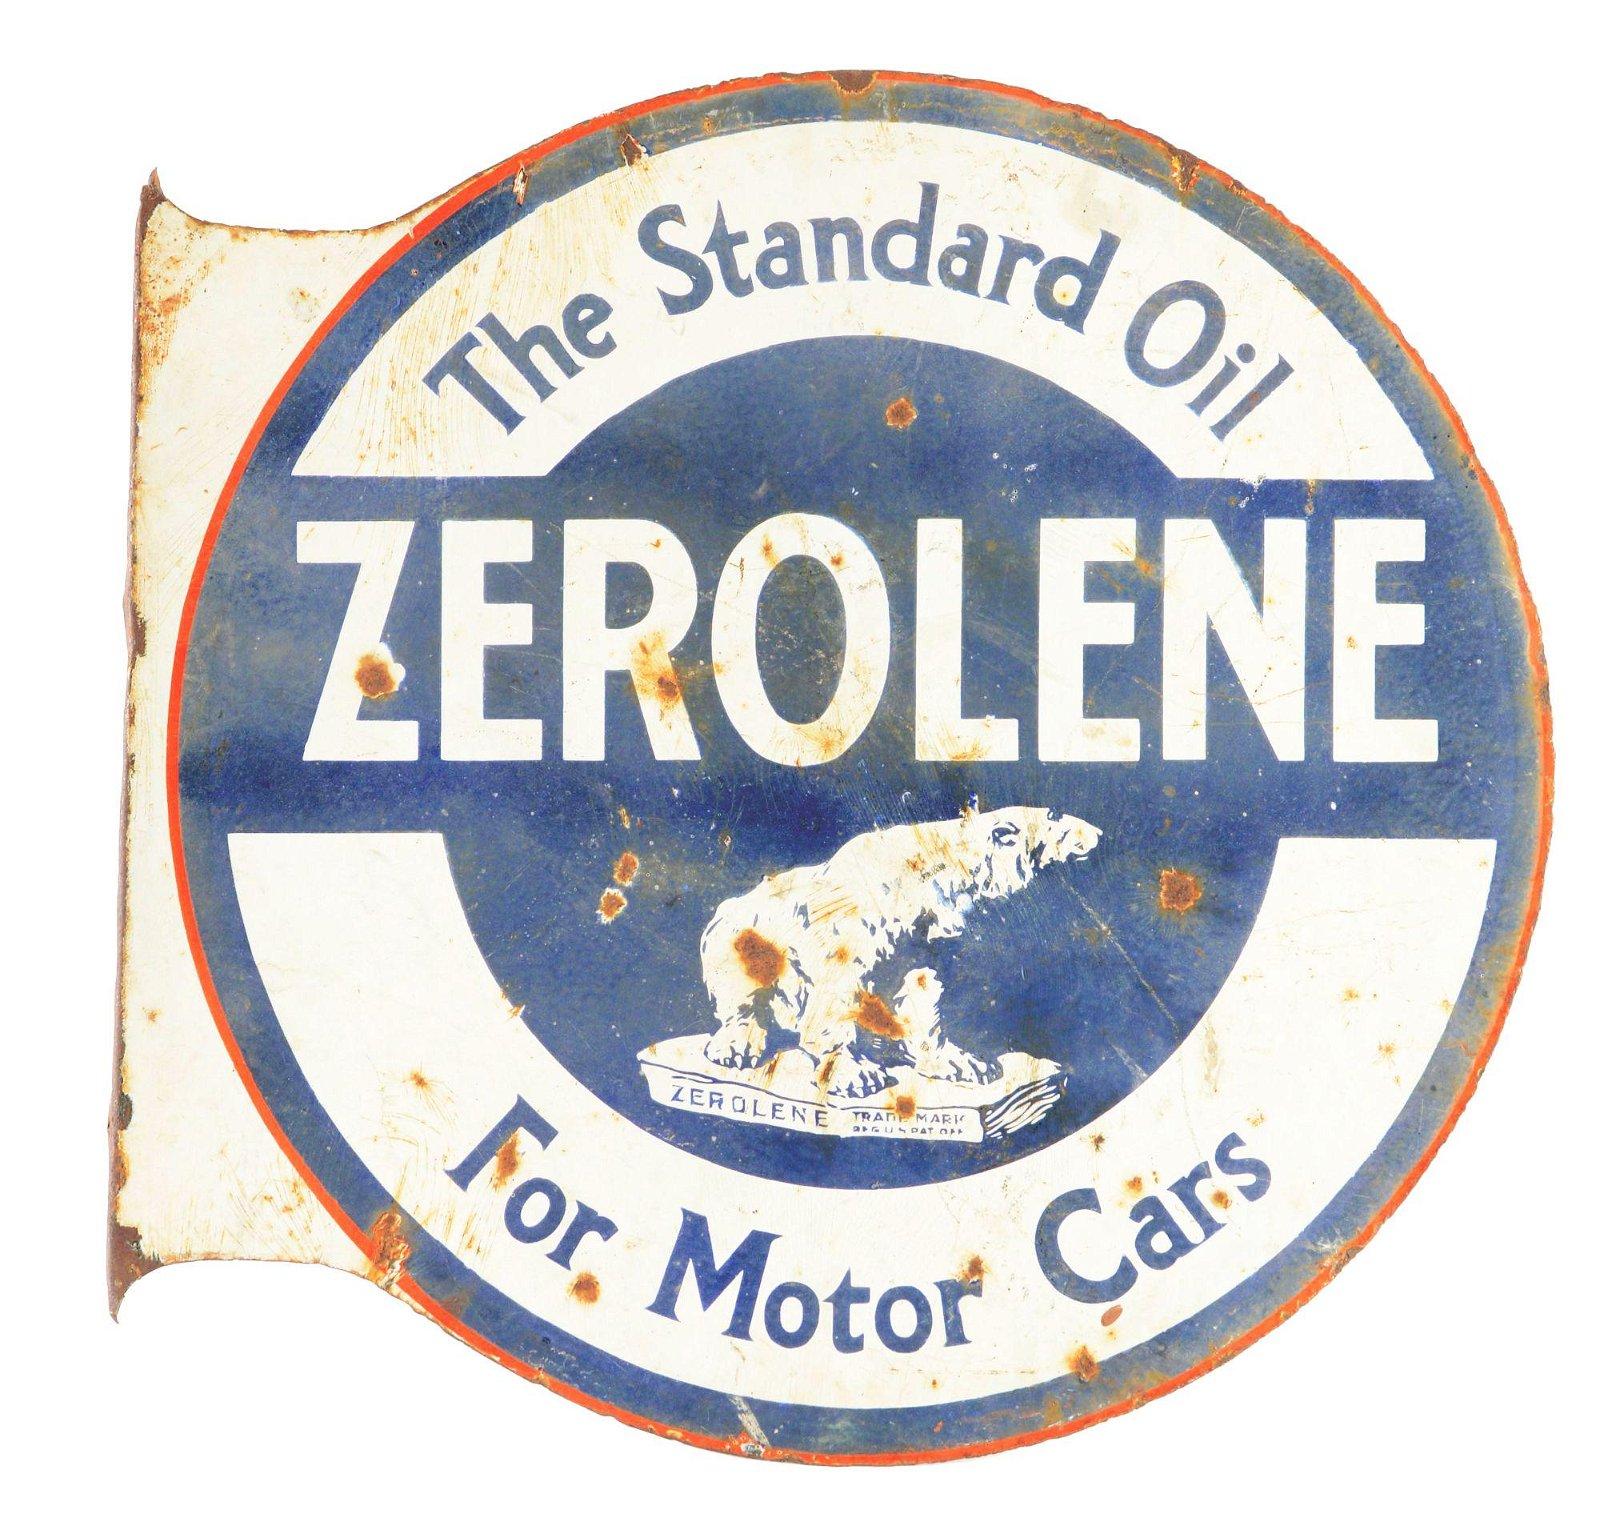 Zeroline Motor Oil Porcelain Flange Sign W/ Polar Bear